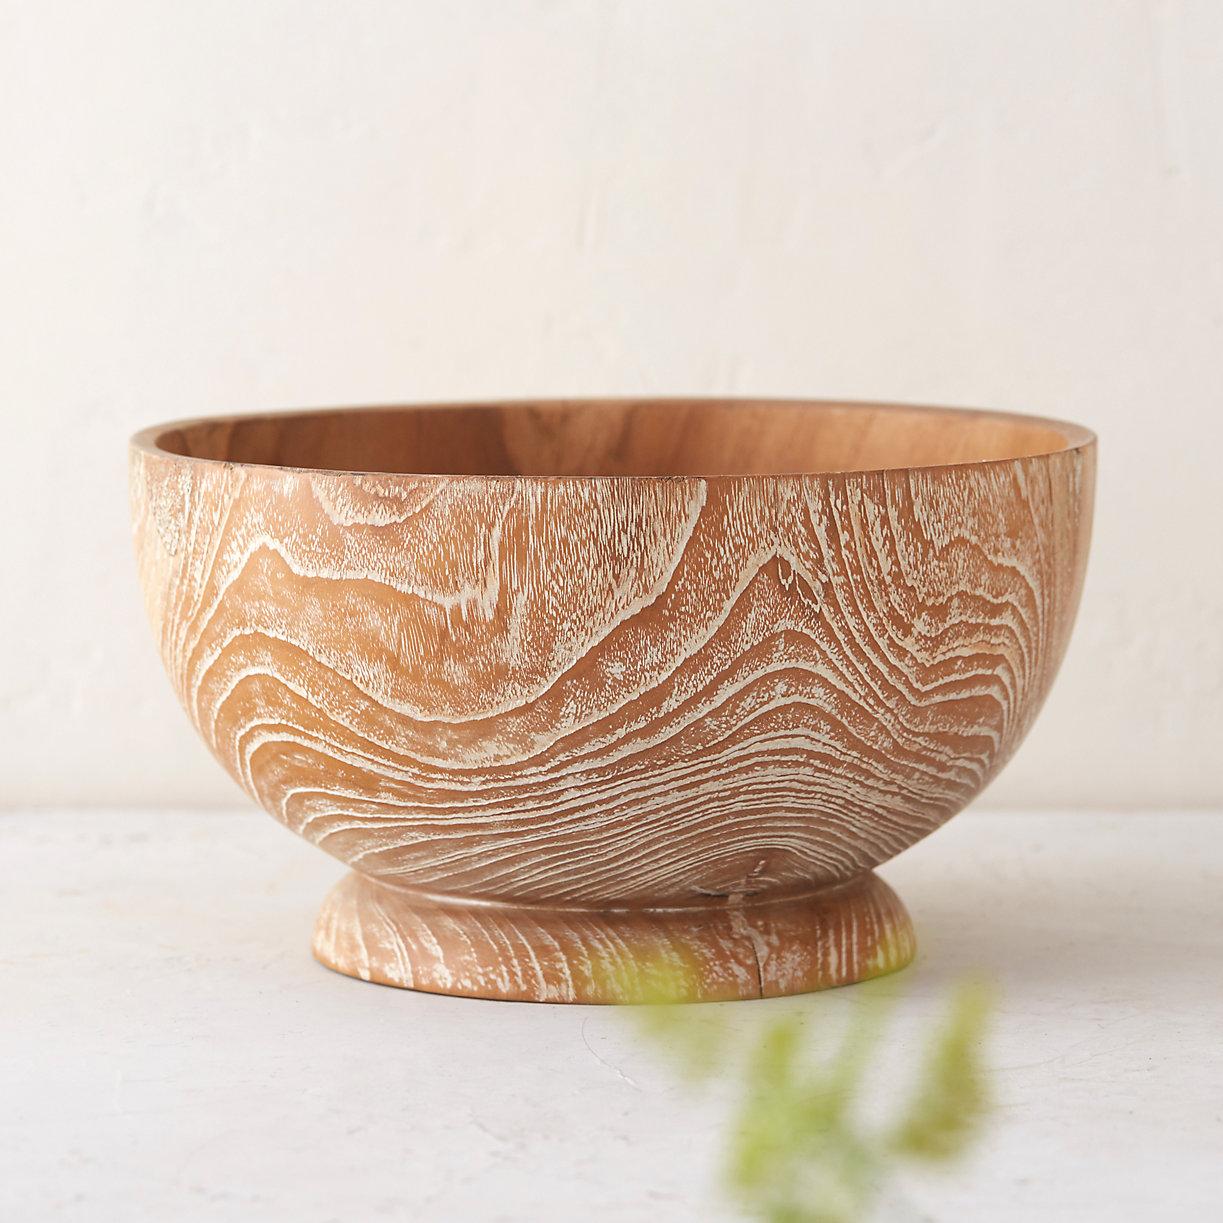 Whitewashed teak bowl